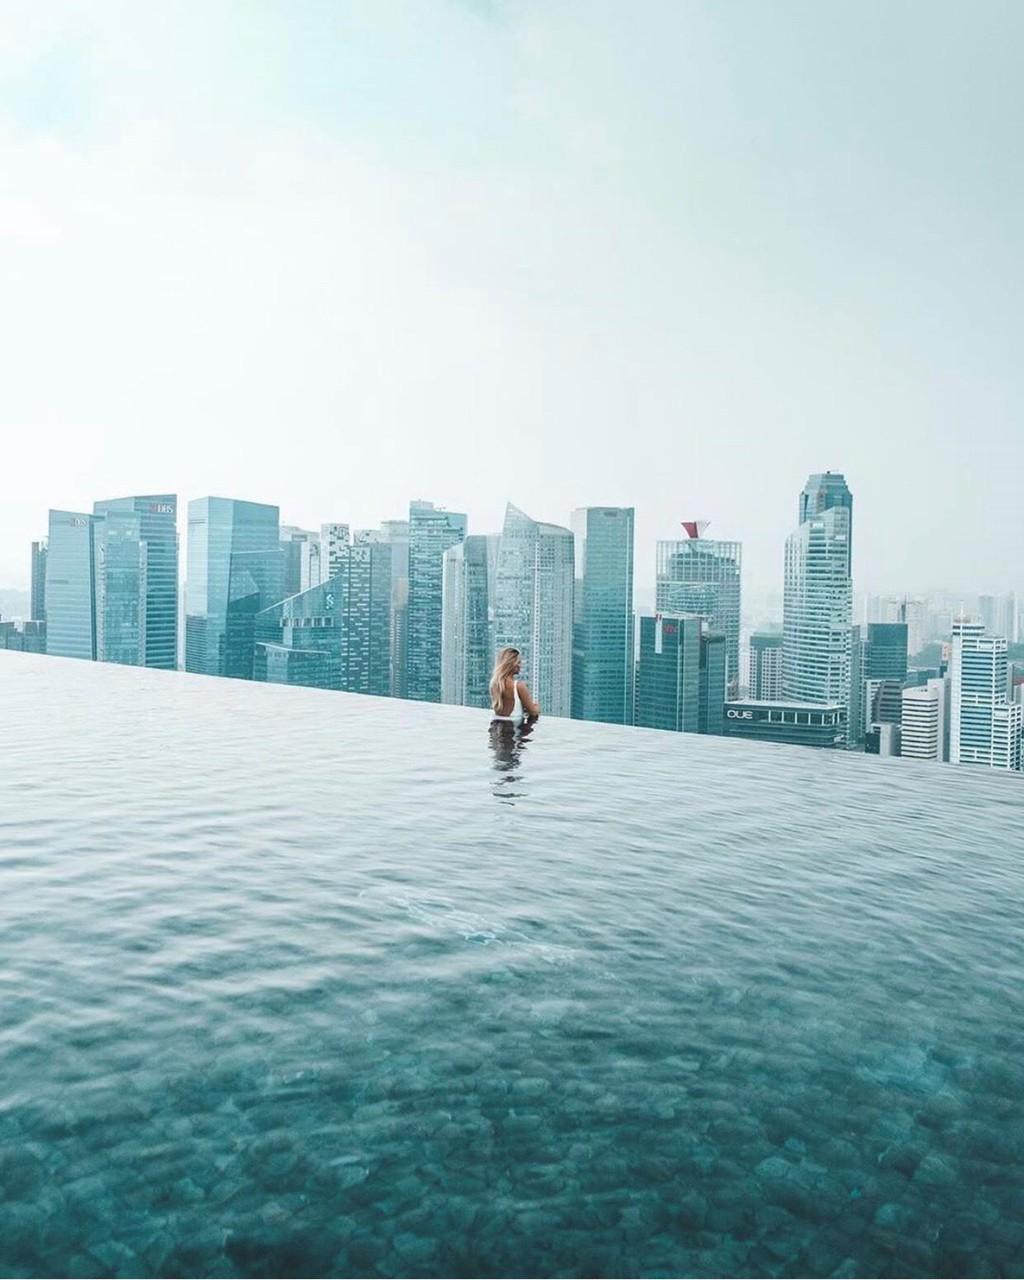 Do sang chanh cua khu nghi duong noi tieng nhat Singapore hinh anh 5